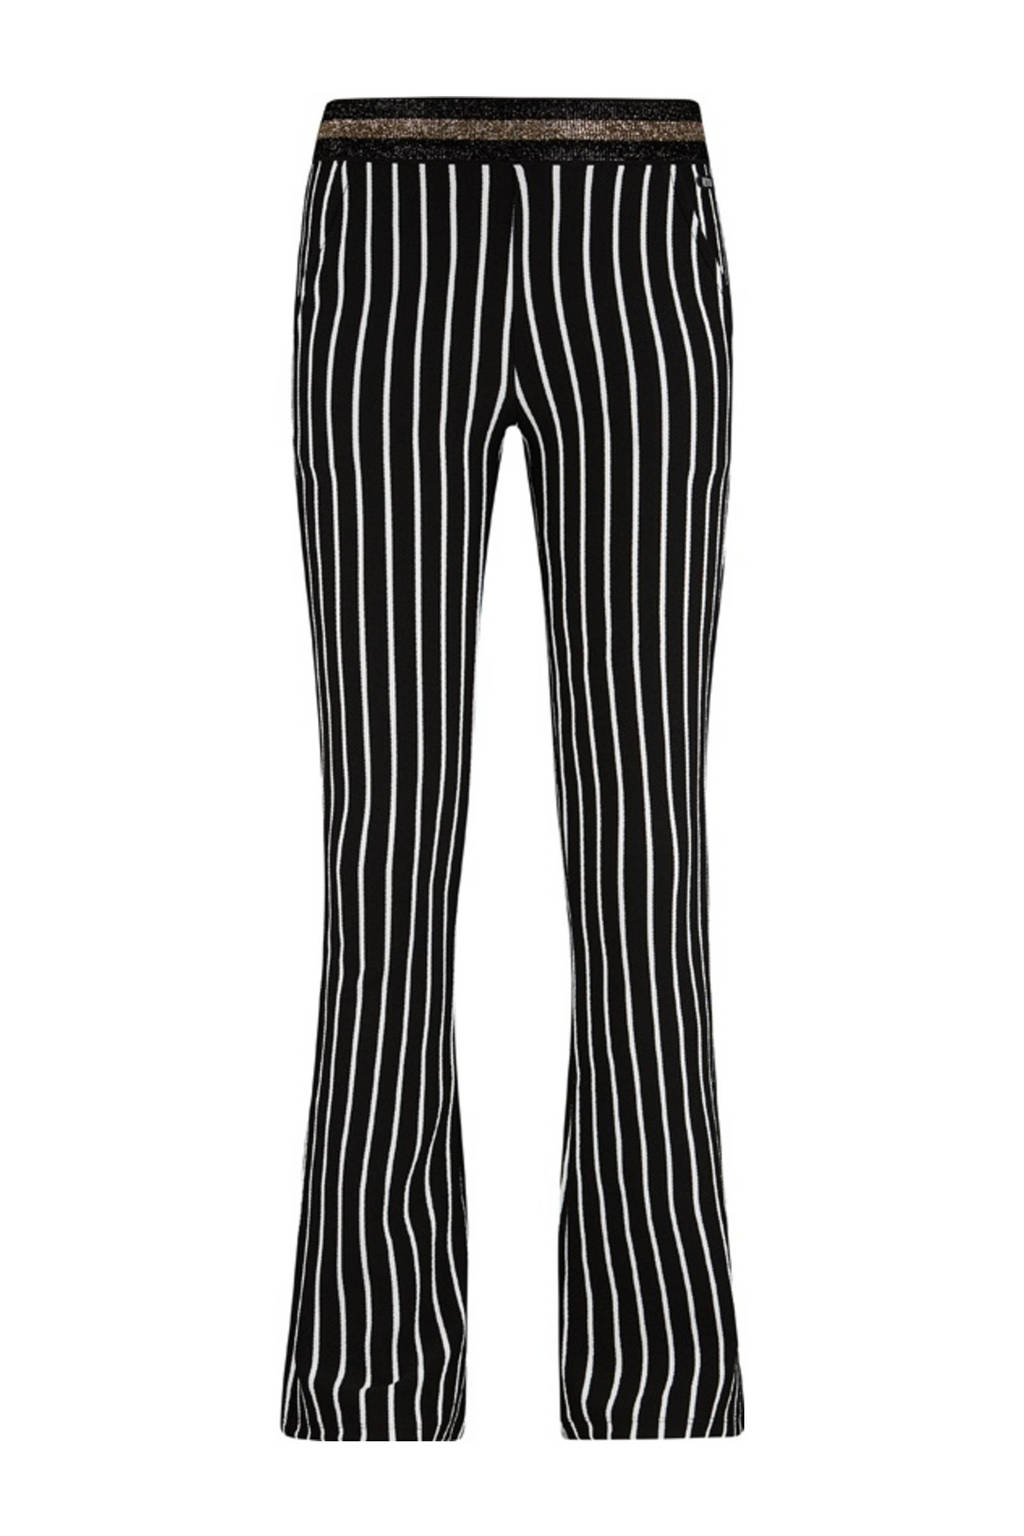 Retour Denim gestreepte flared broek Helga zwart/wit, Zwart/wit